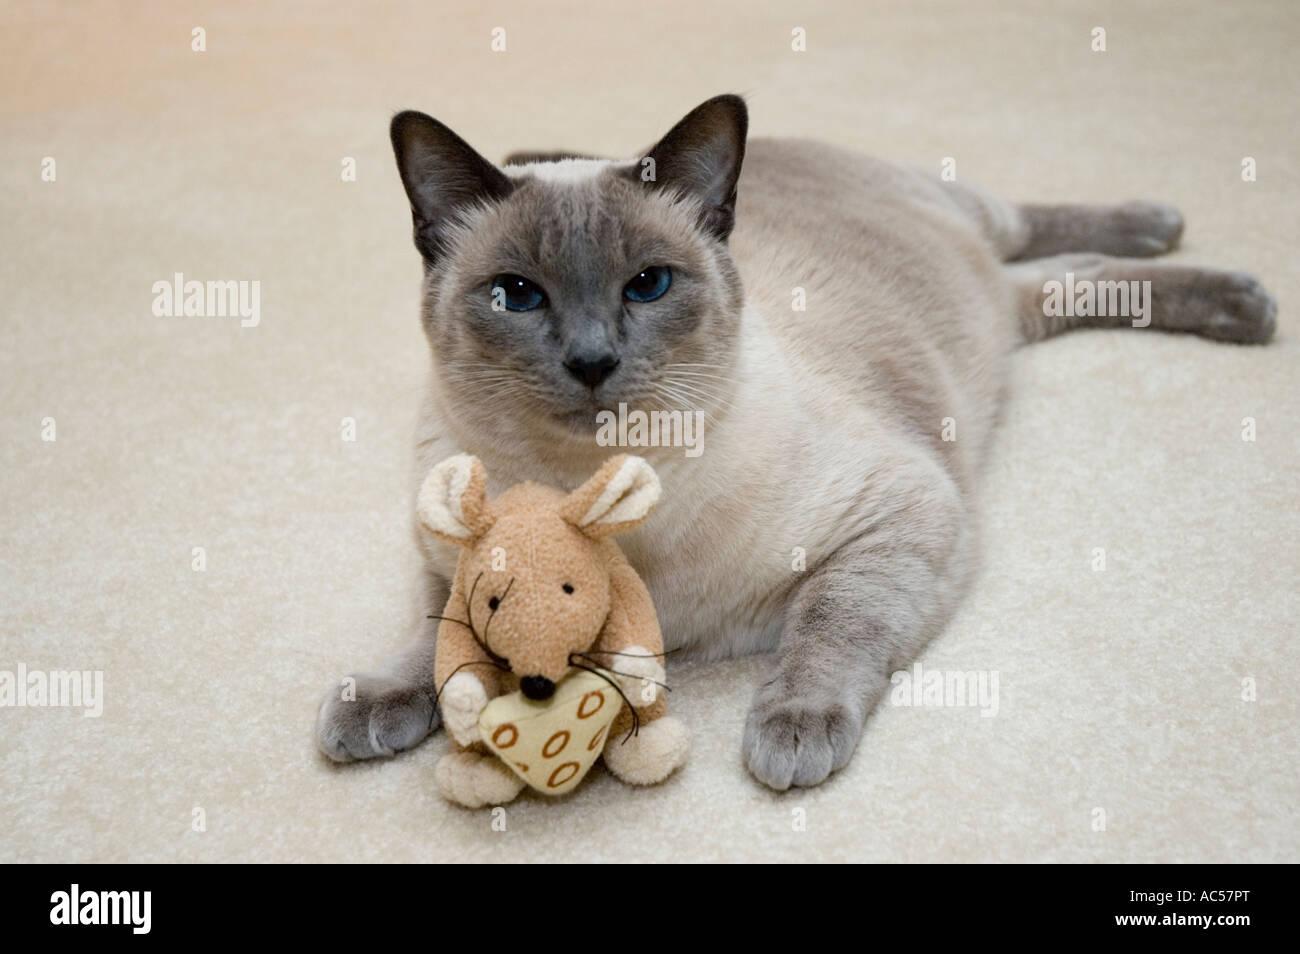 Blue Point Siamese Cat Stuffed Animal